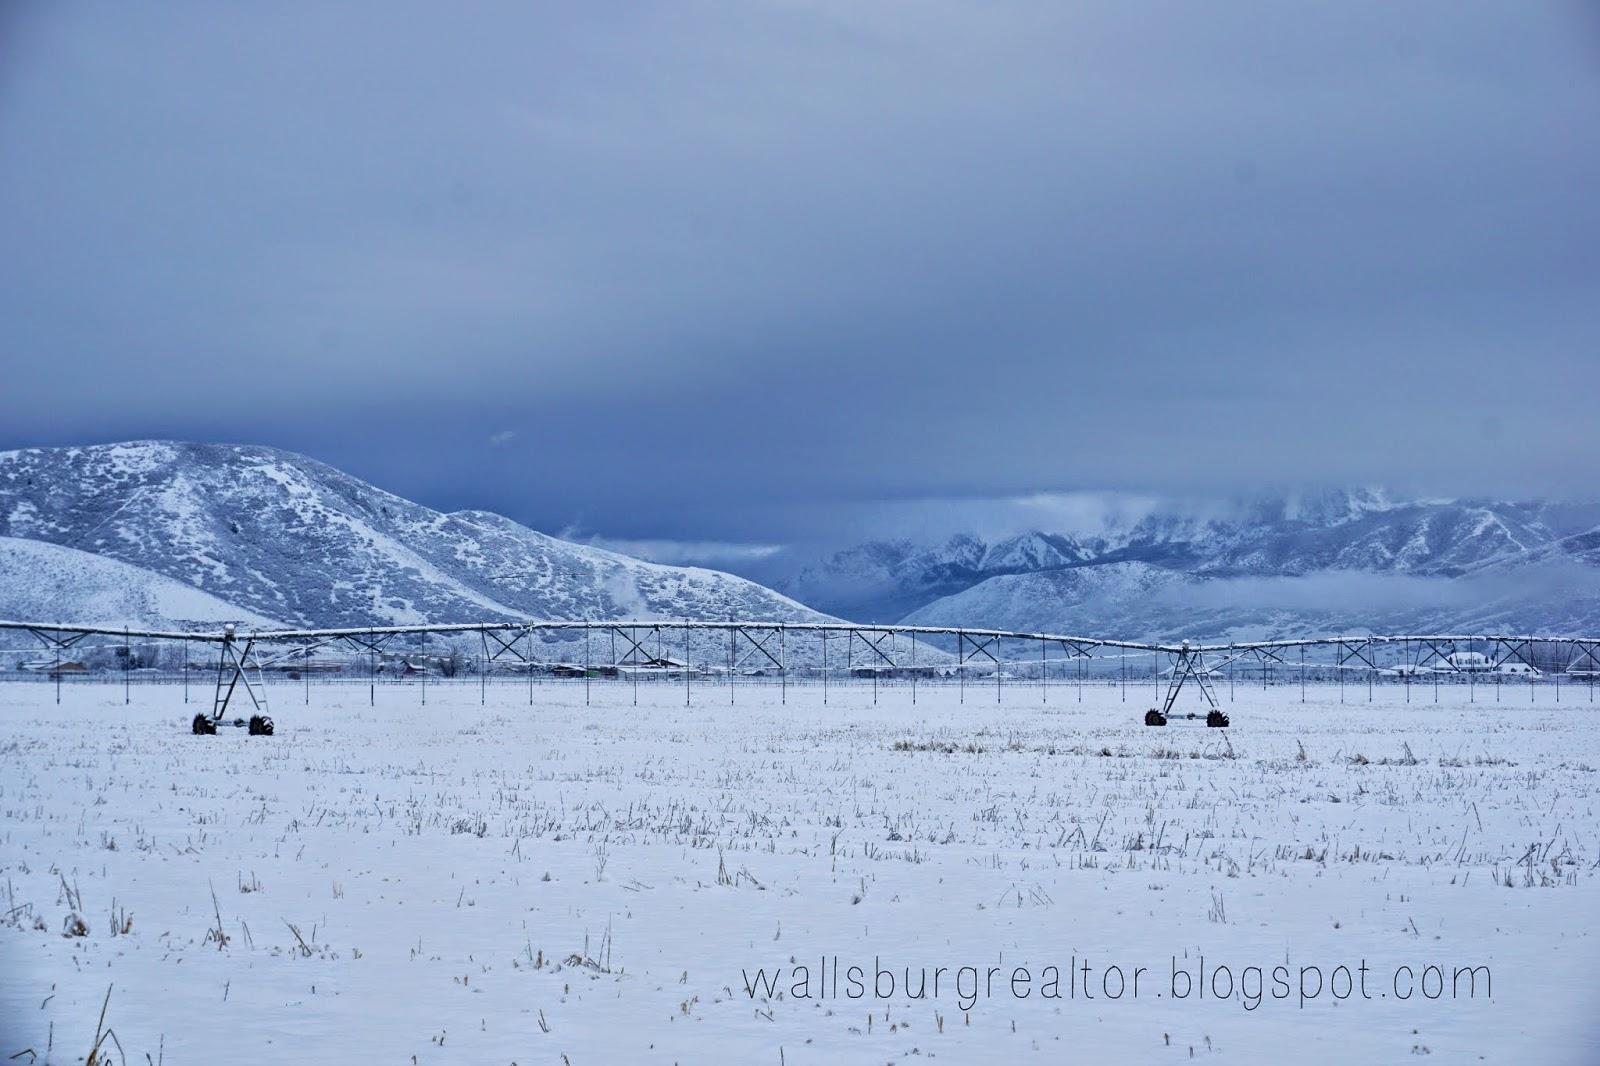 Snow in Wallsburg